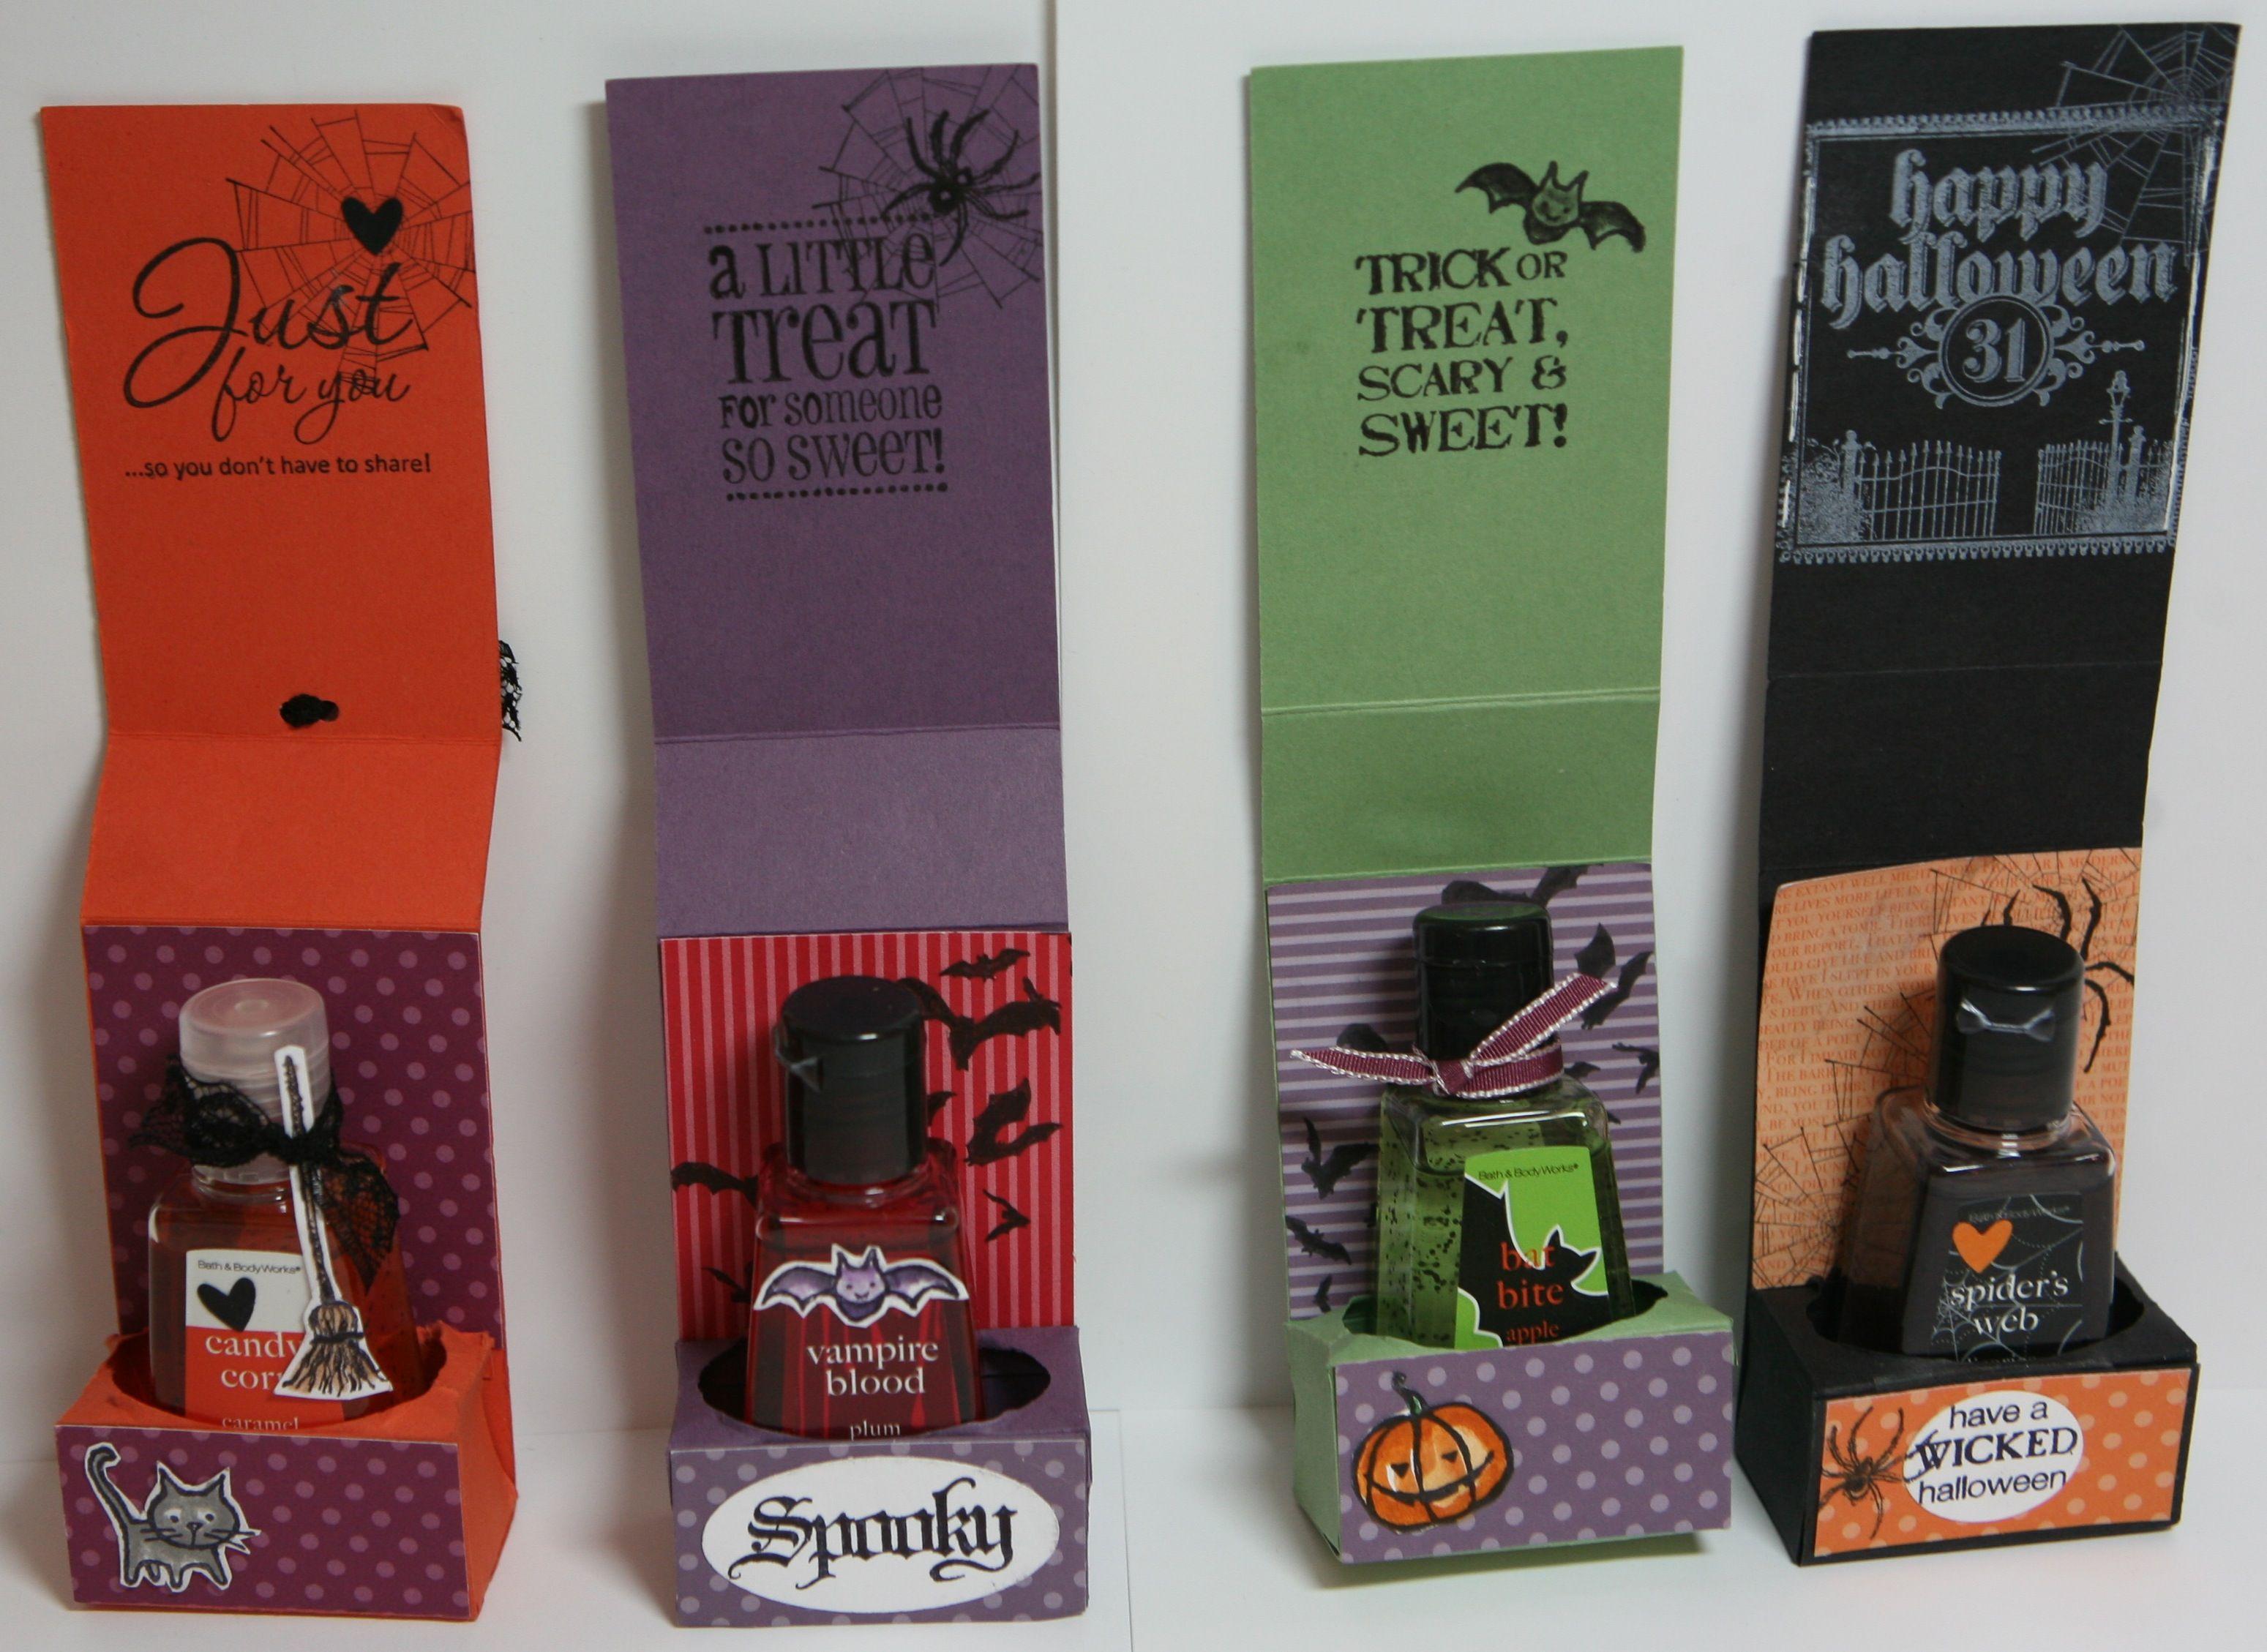 stampin up projects tastic stampingjillcom jill - Stampin Up Halloween Ideas